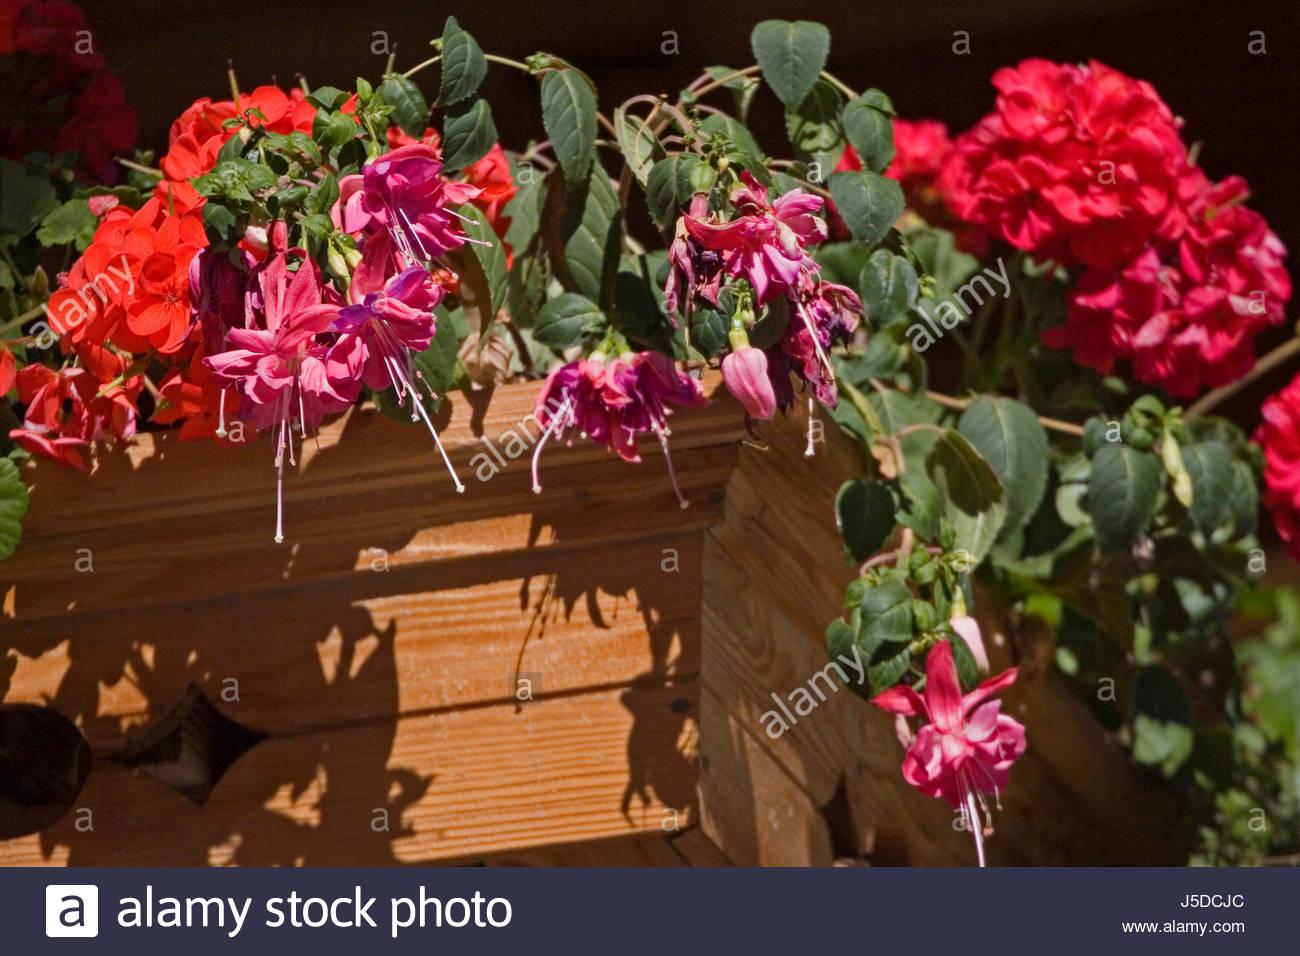 Holz Blume Vereinbarungen Balkon Lila Blute Dekorative Fuchsien Rot